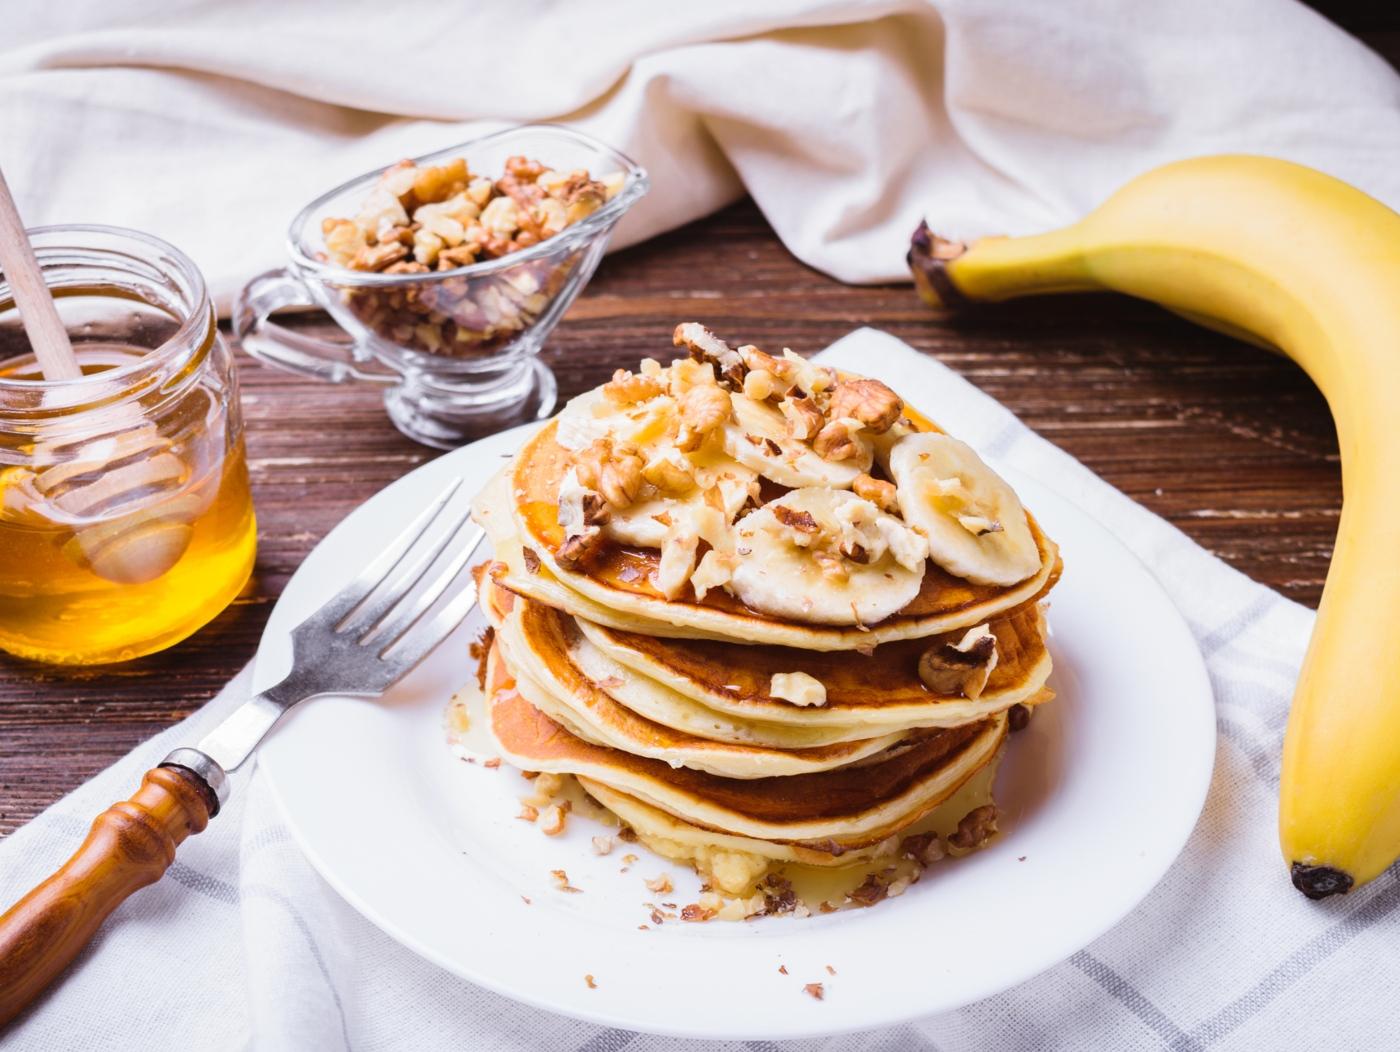 Receitas de panquecas de aveia e banana